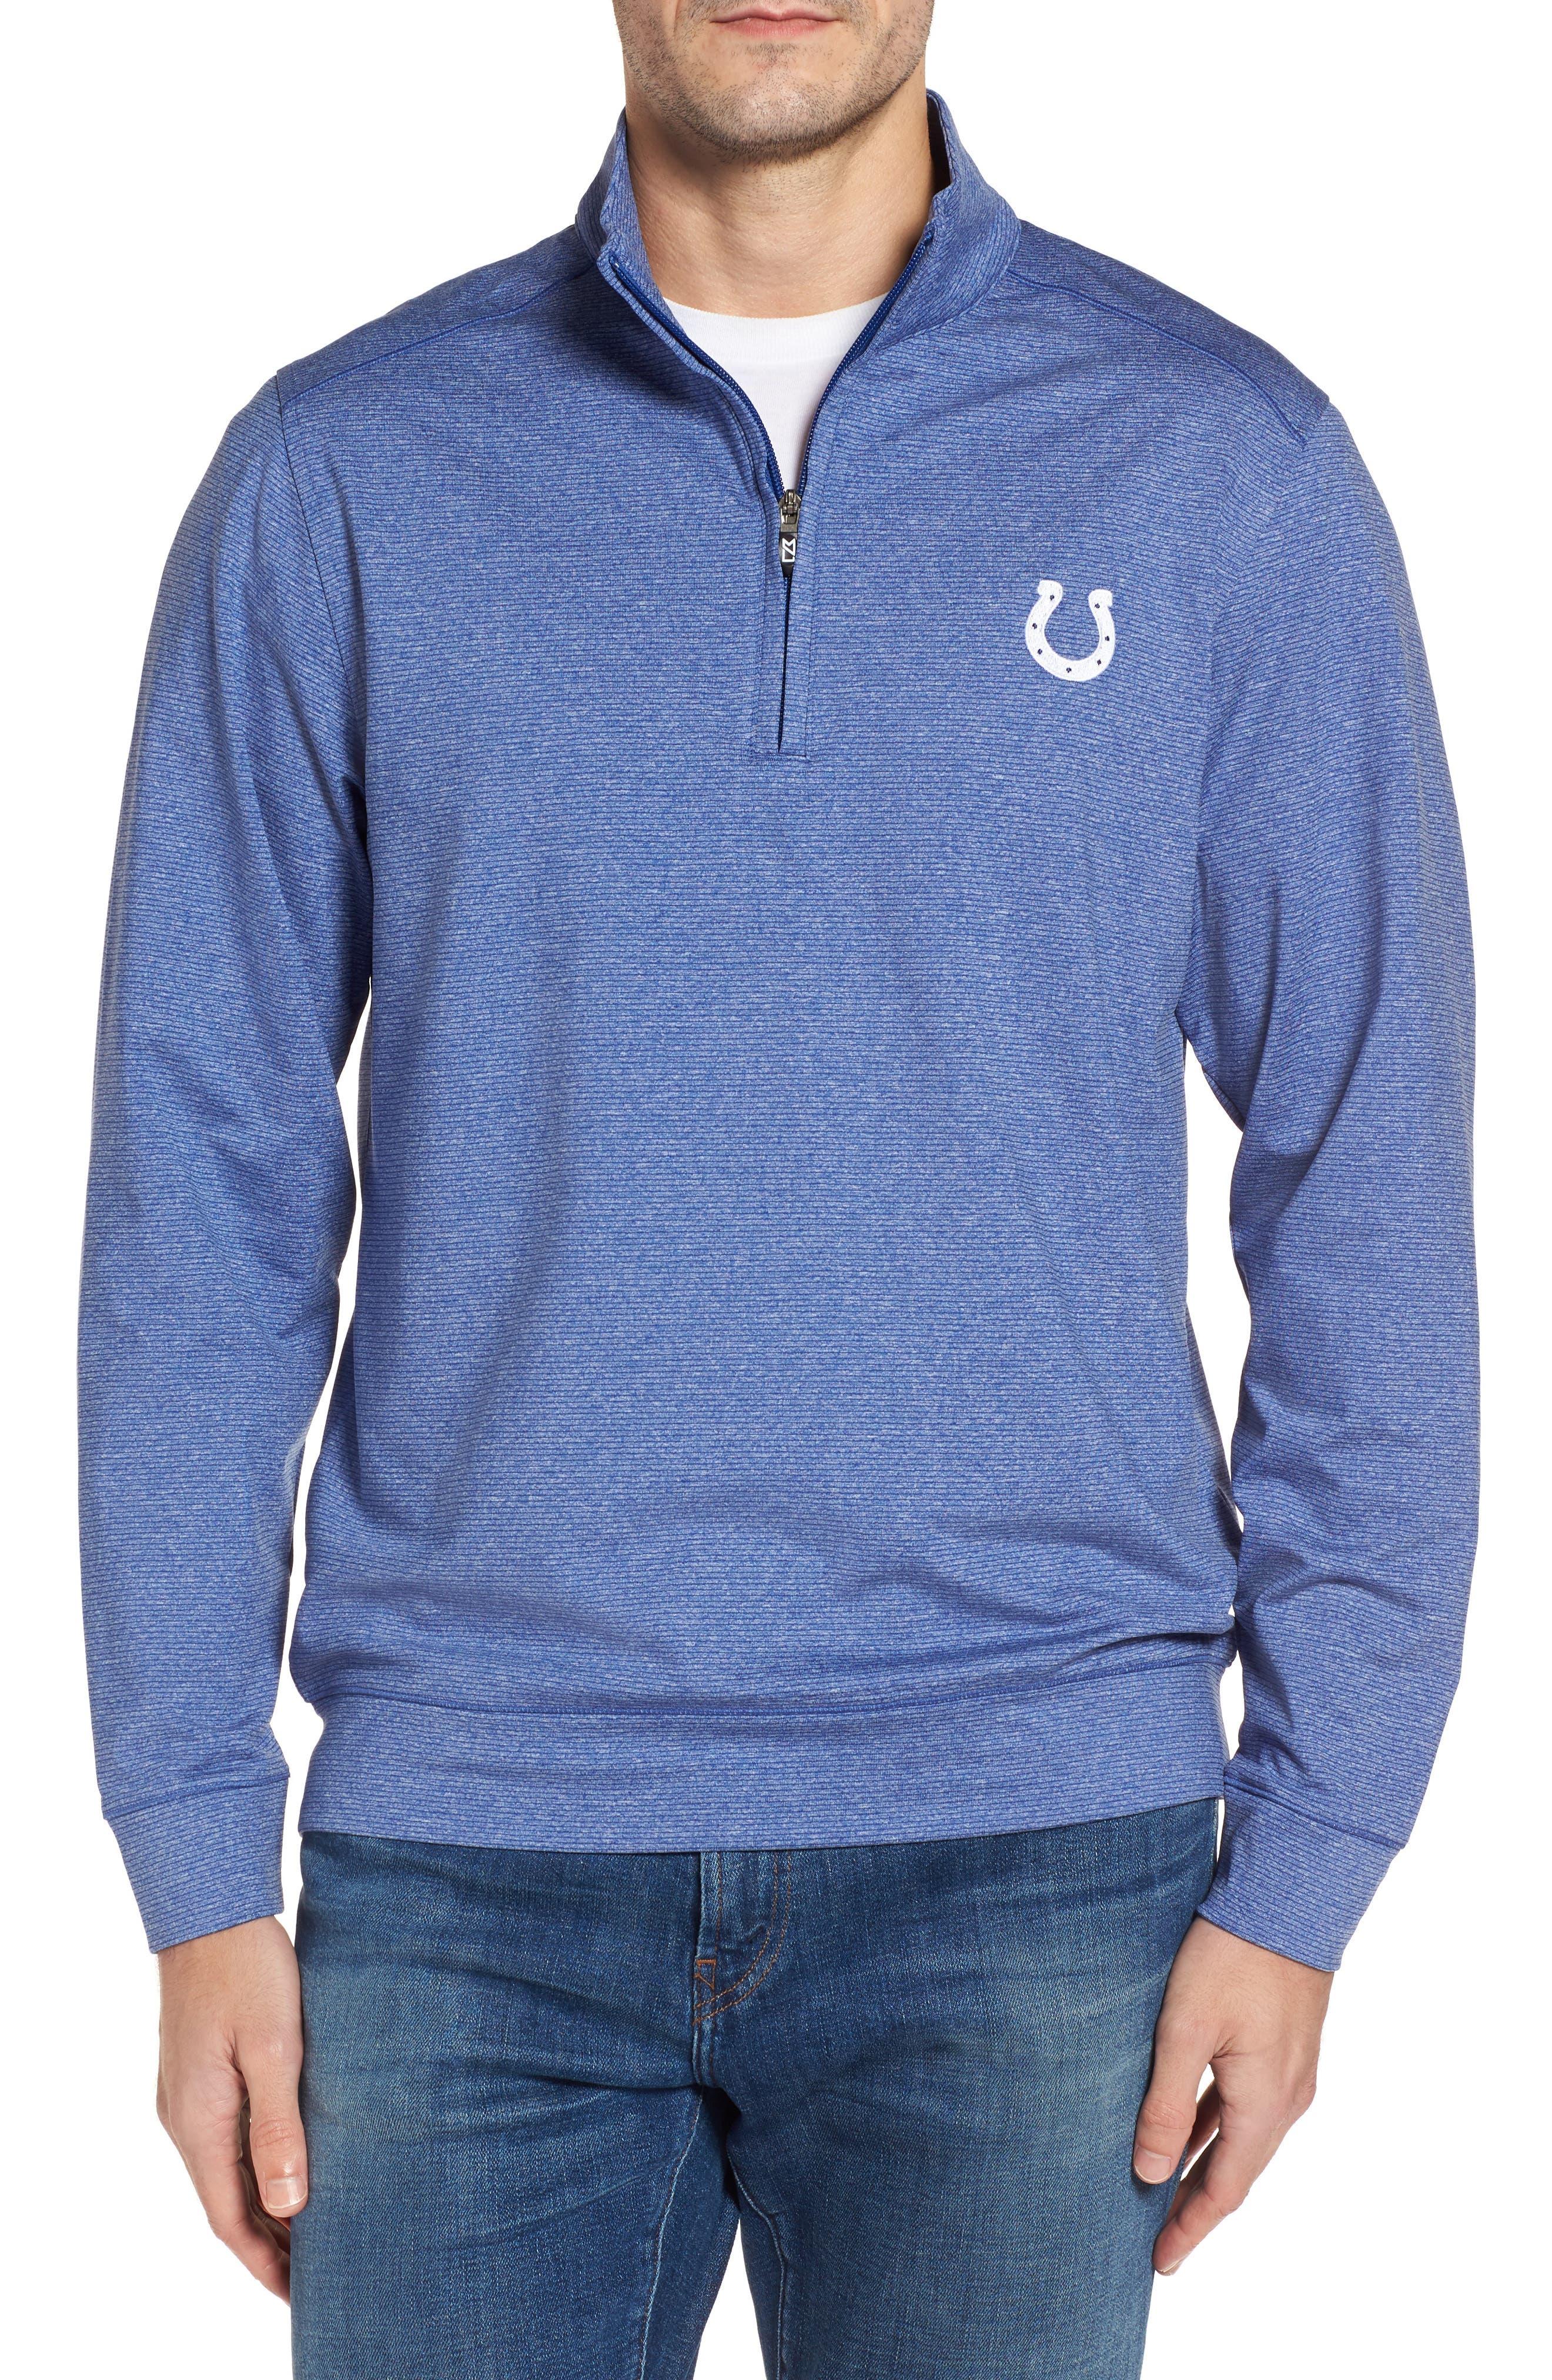 Cutter & Buck Shoreline - Indianapolis Colts Half Zip Pullover